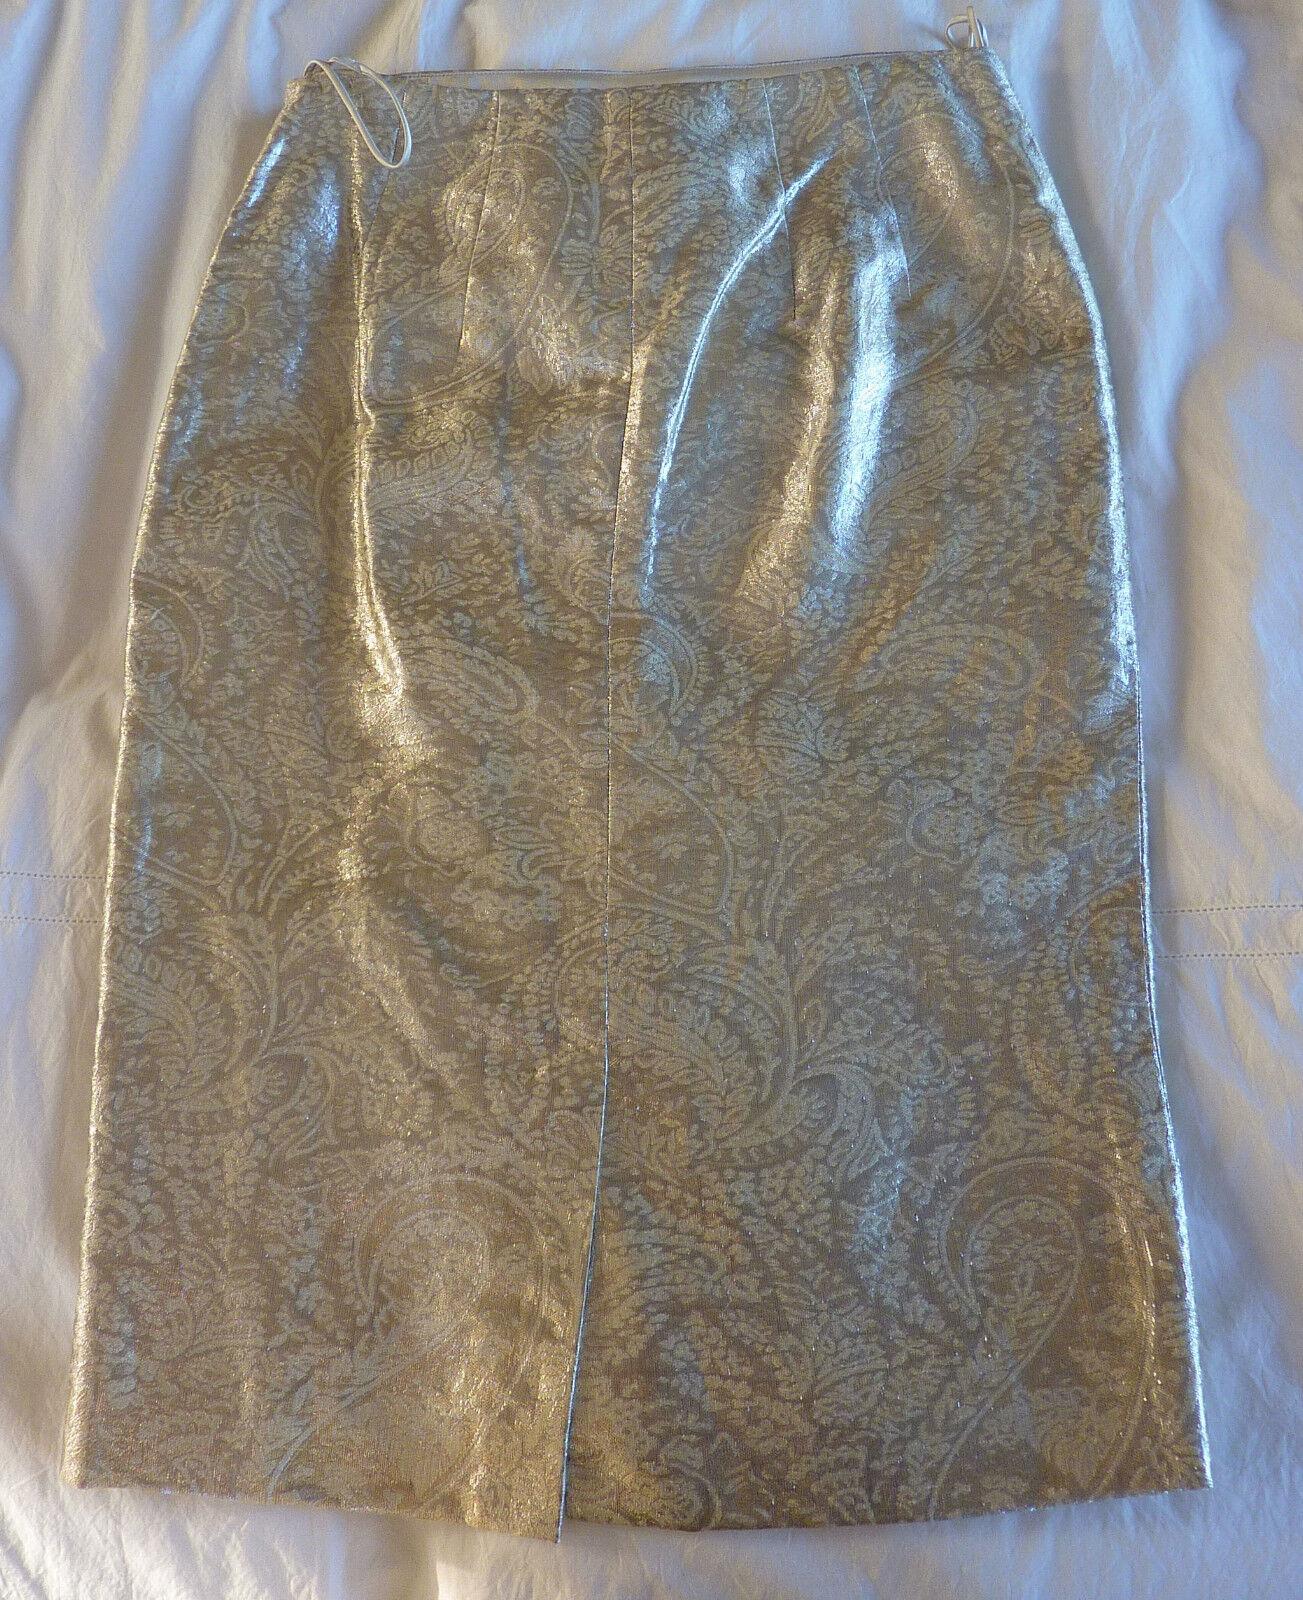 RALPH LAUREN Collection NWT Silber Metallic Knee-Length Skirt, Retail Price  898